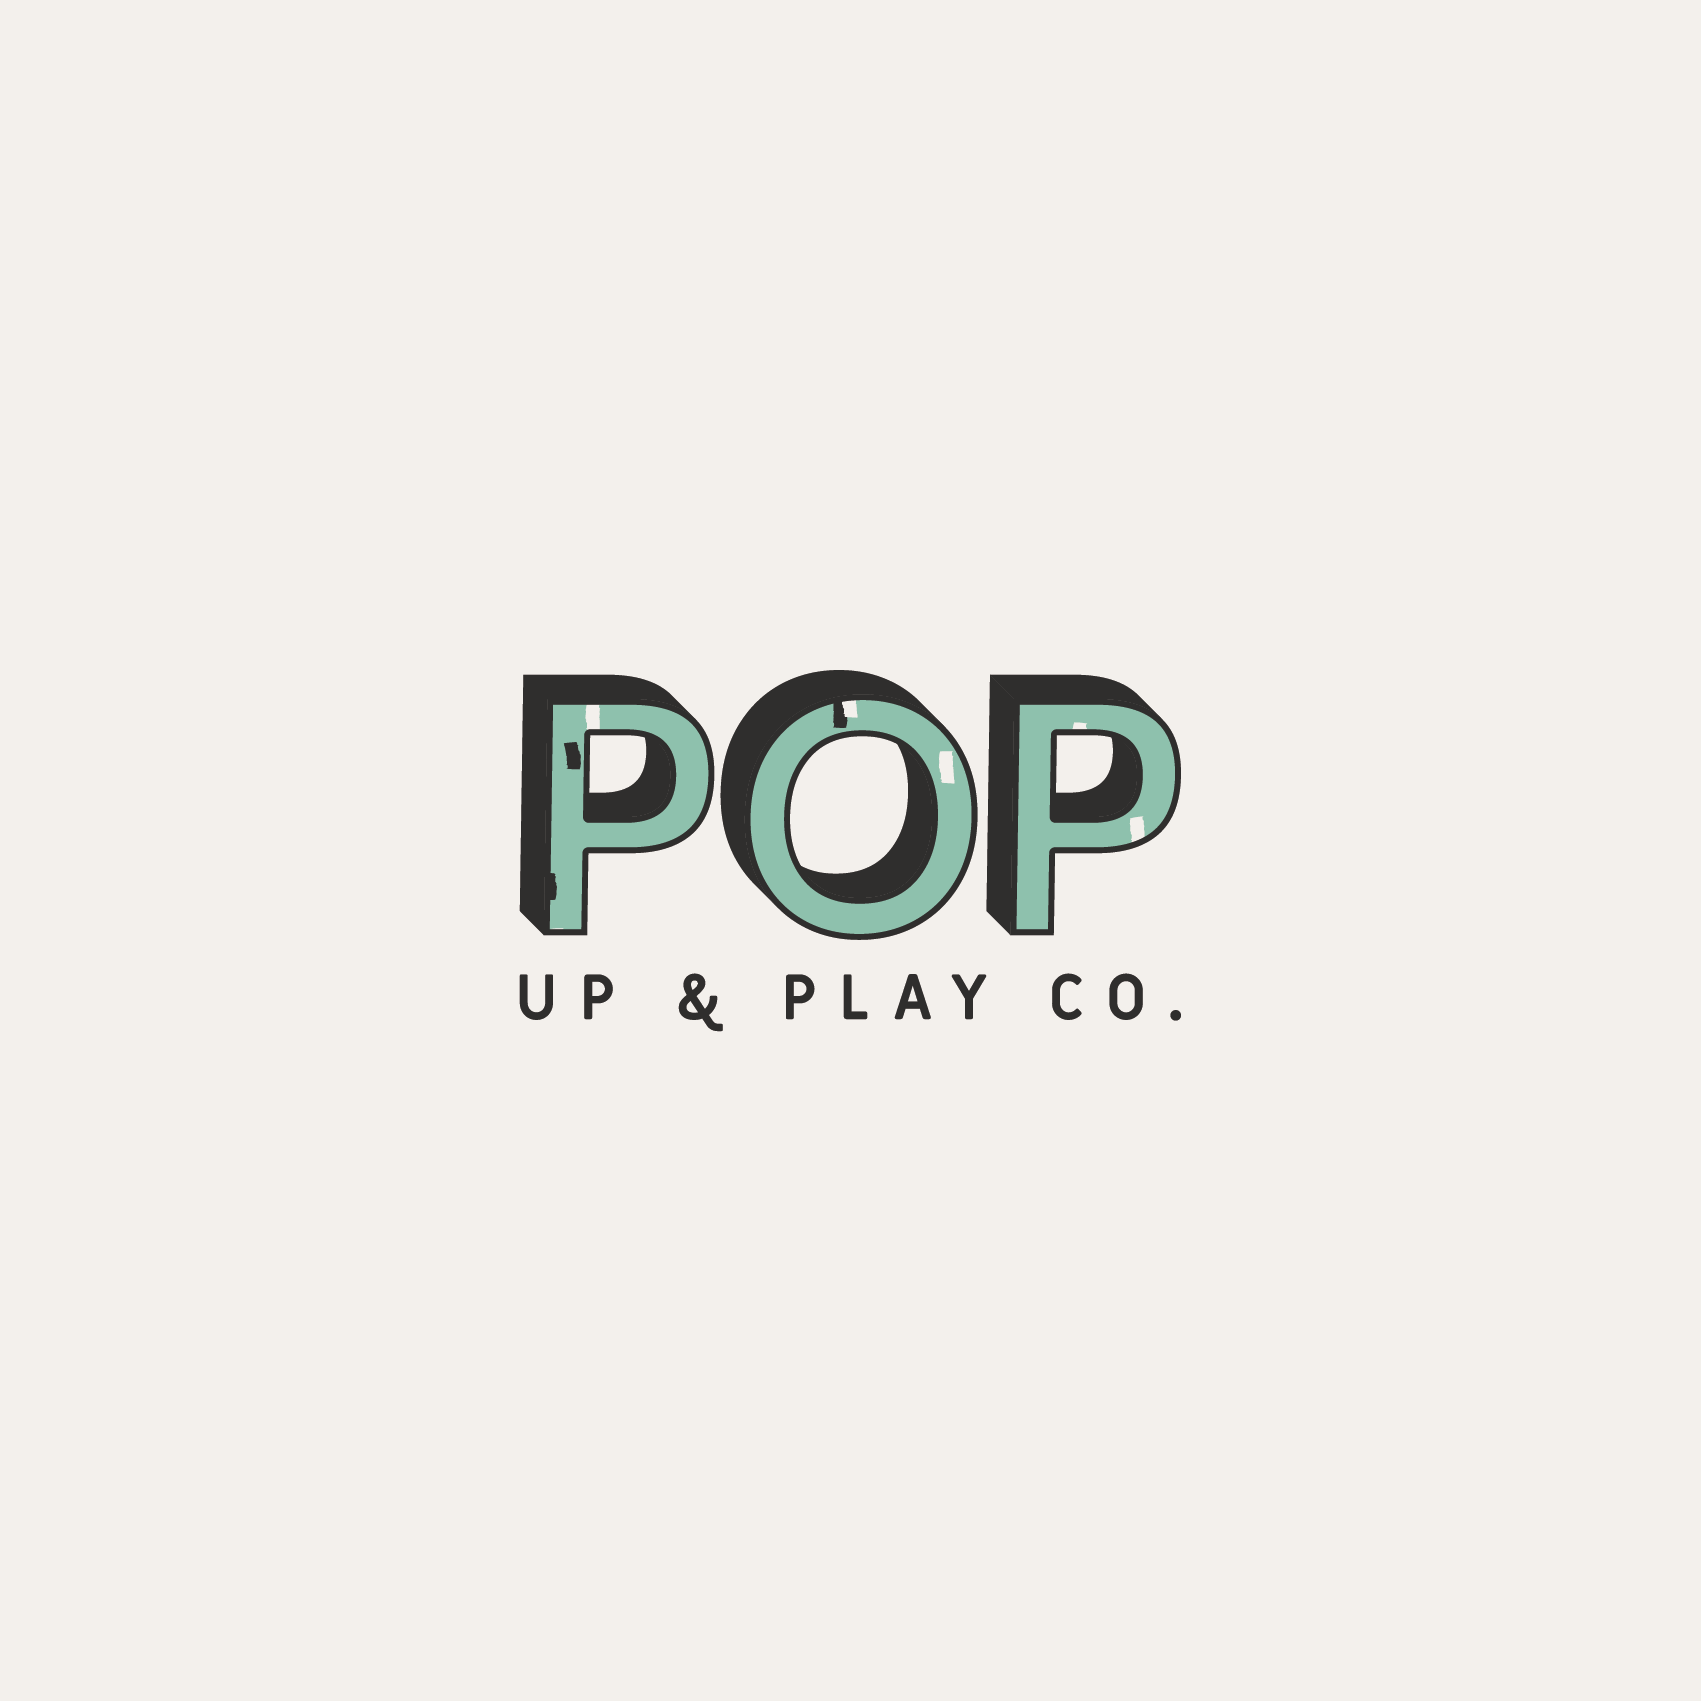 Pop Green on Cream Sq@2x.png